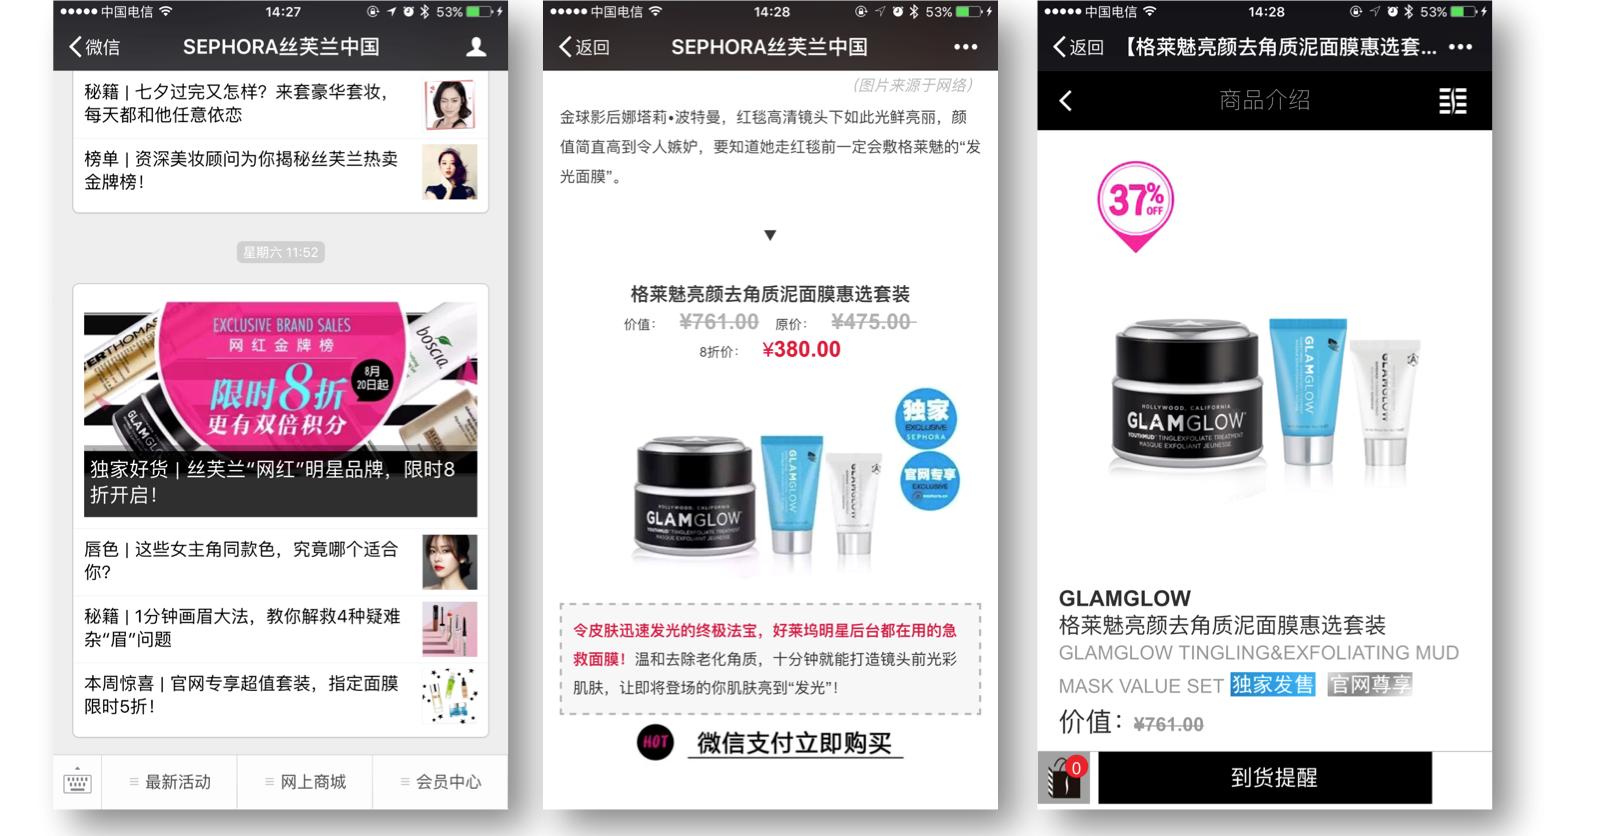 No.1 buzzword in China eCommerce baokuan